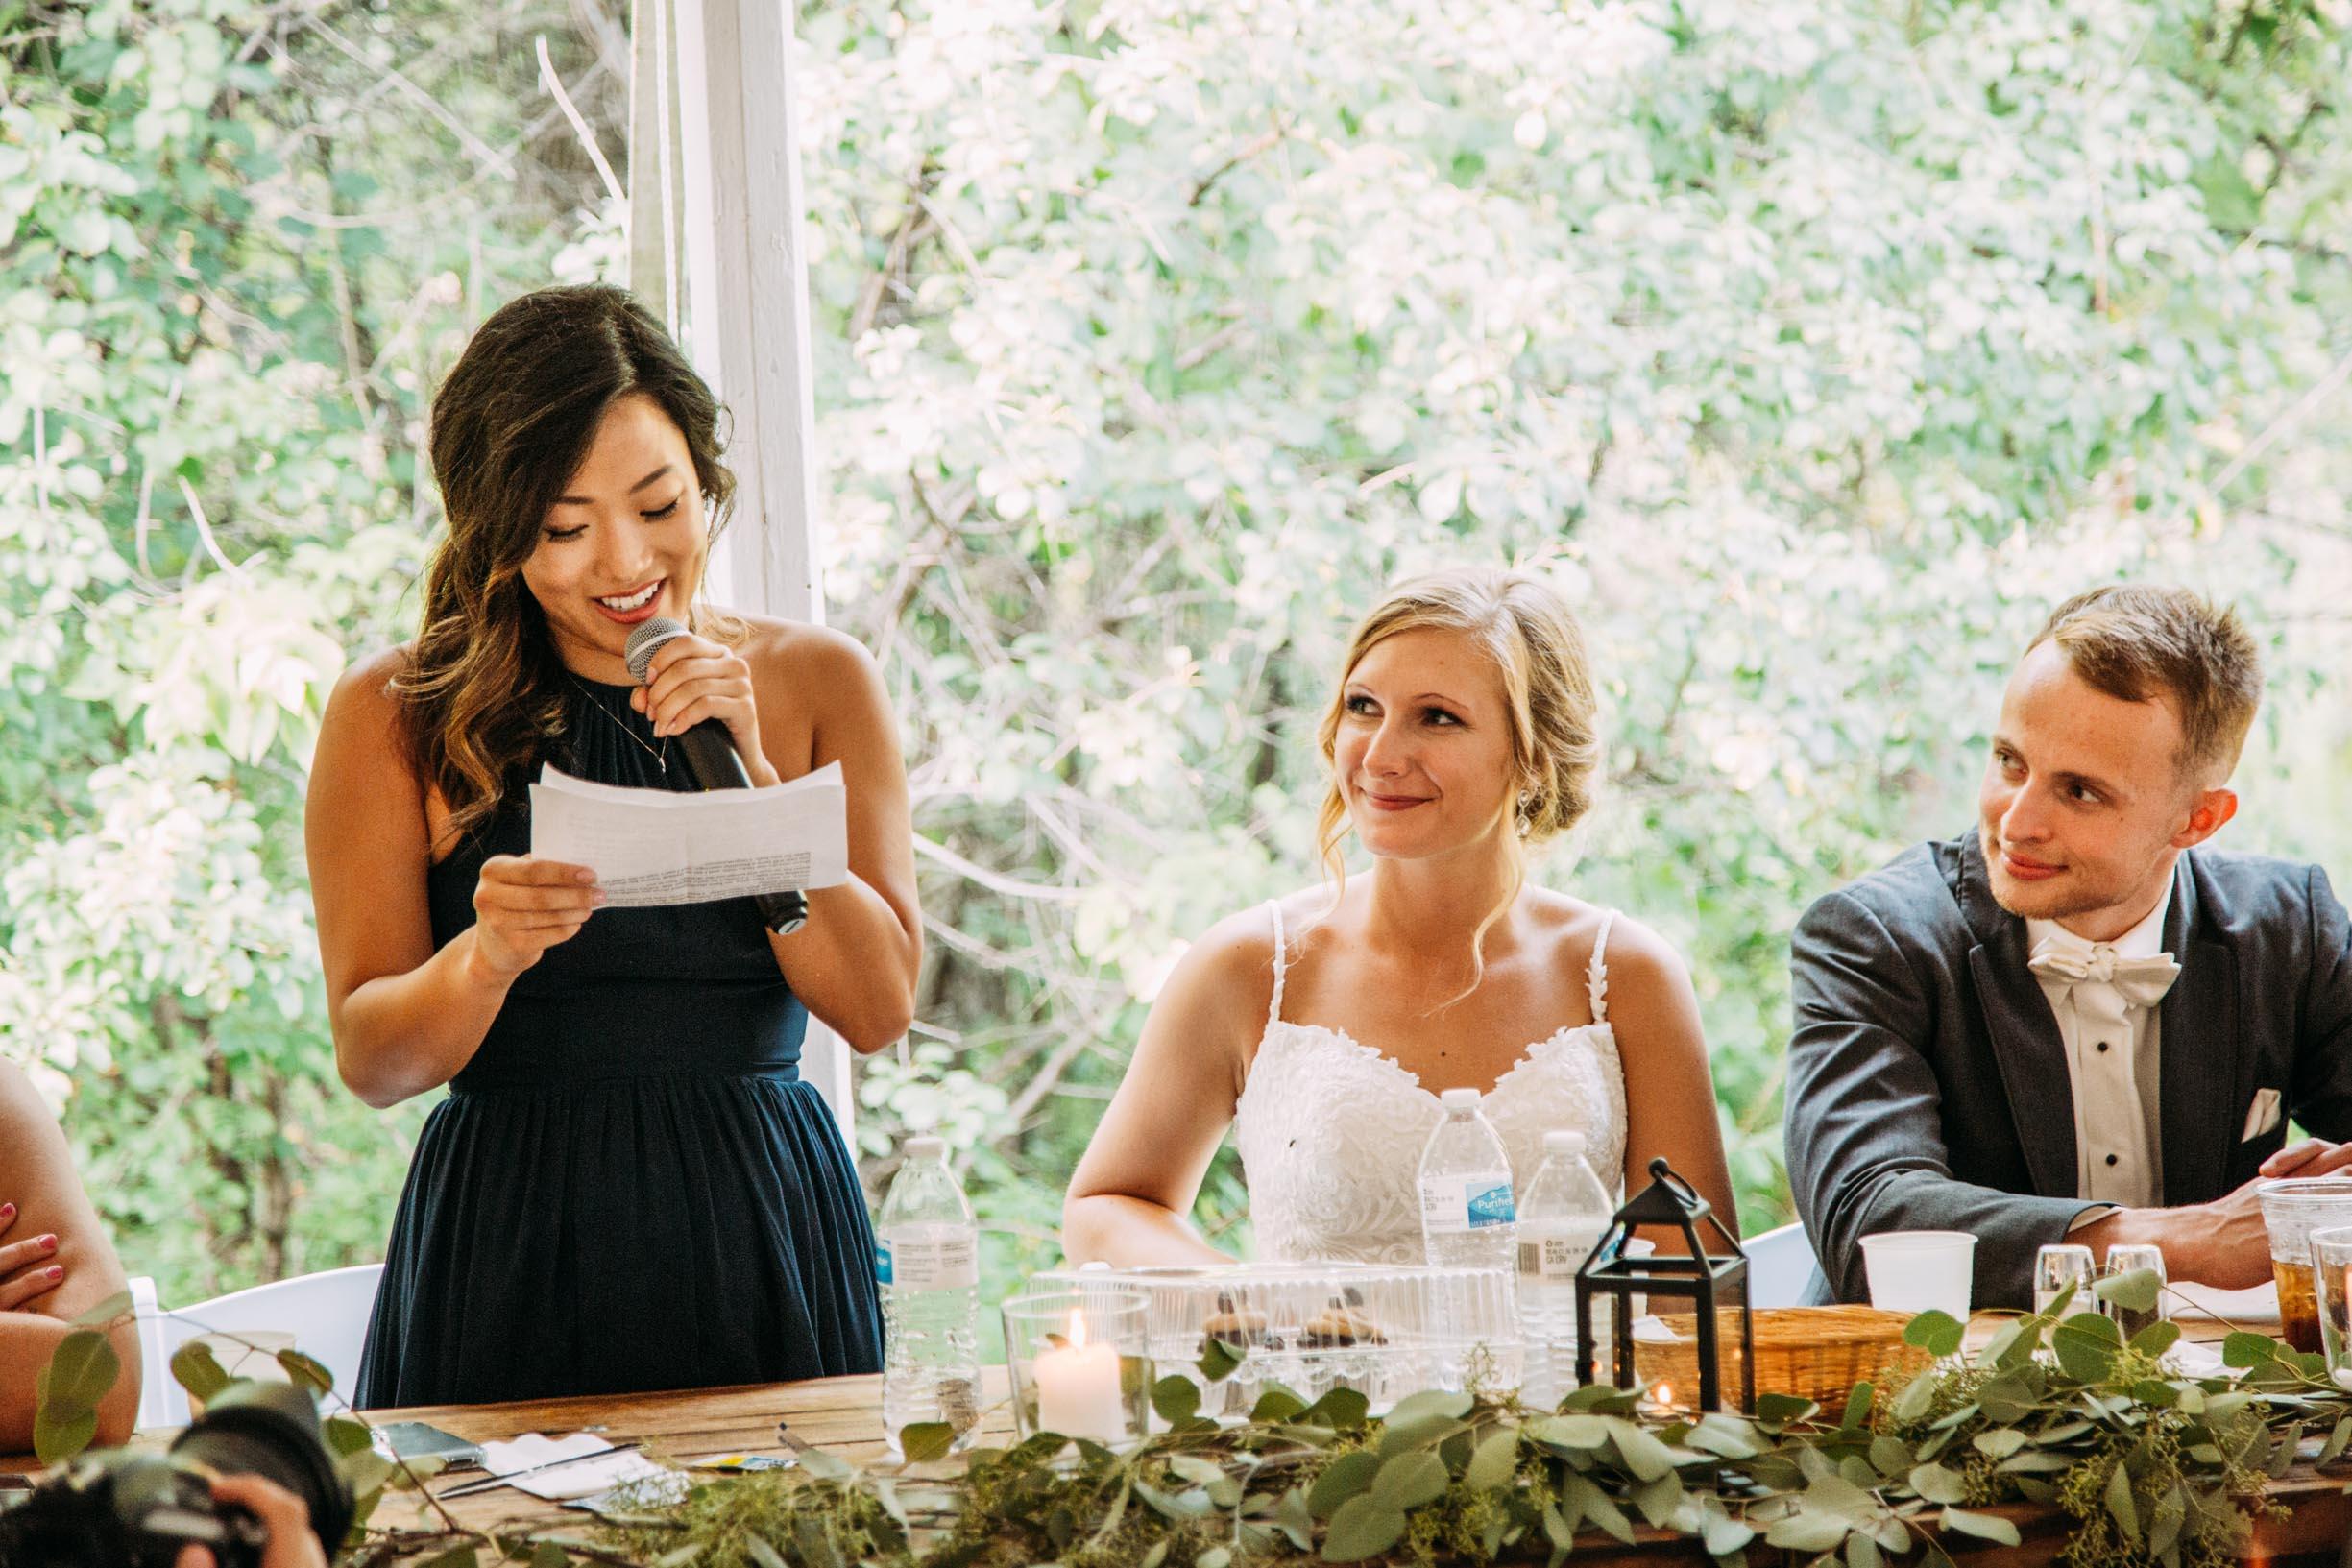 30-Minnetonka Orchards Wedding Ashley Bryce Blog.jpg